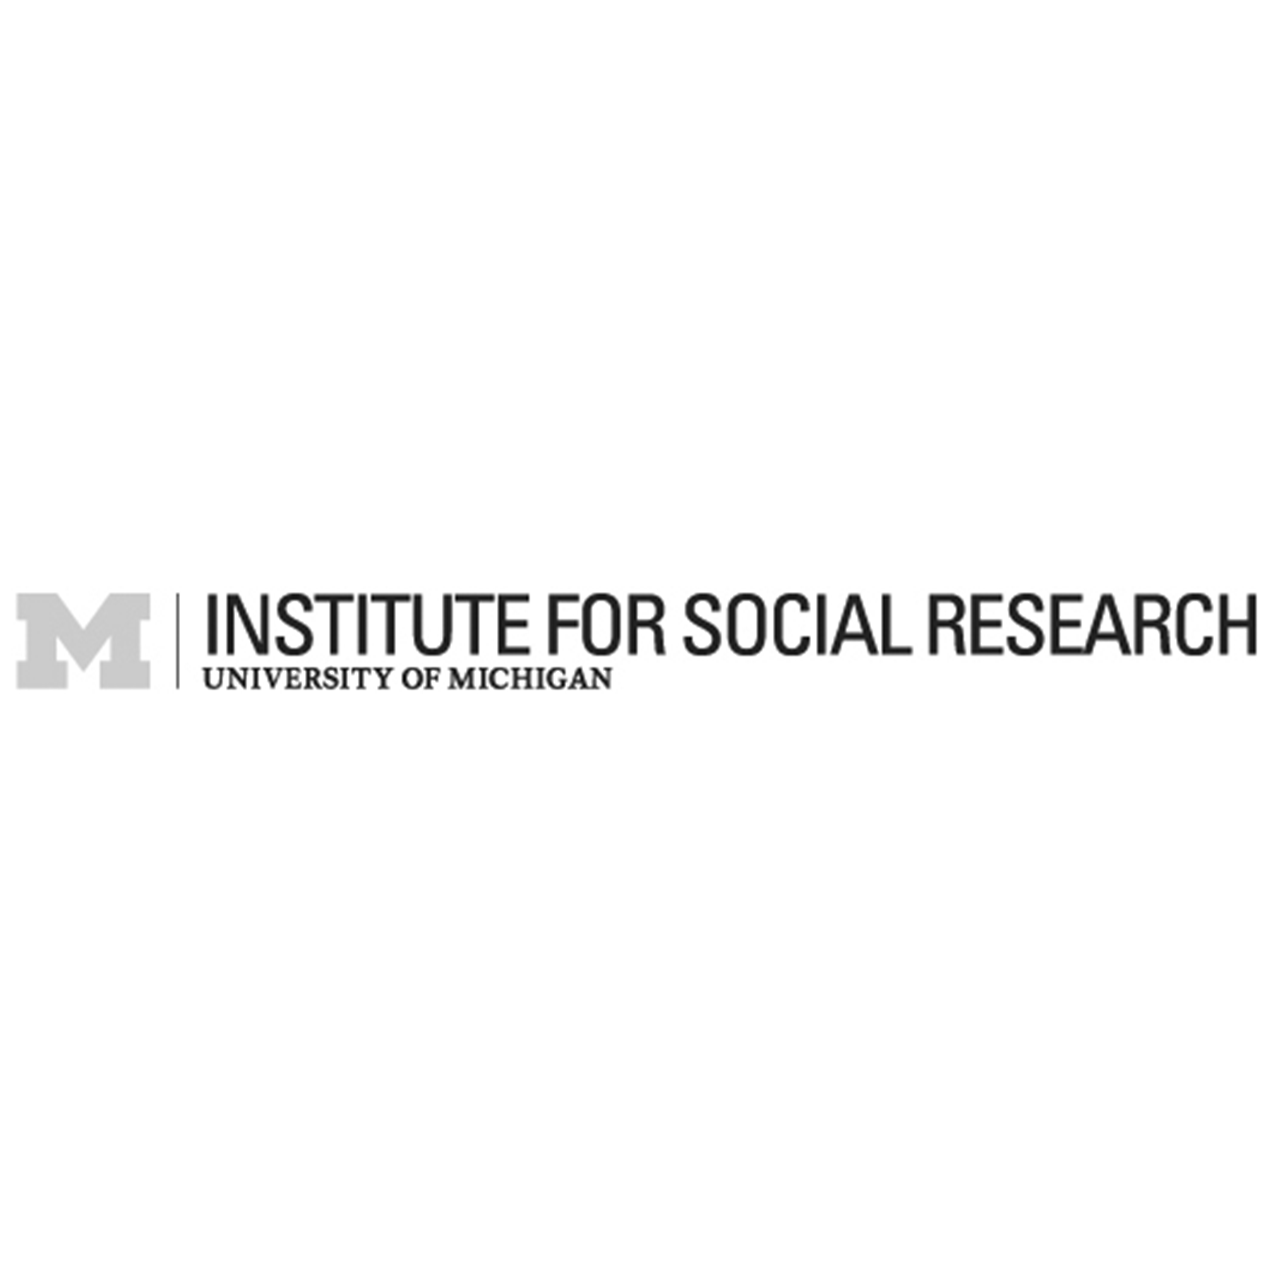 UM_Institute_Soc_Rsrch.png